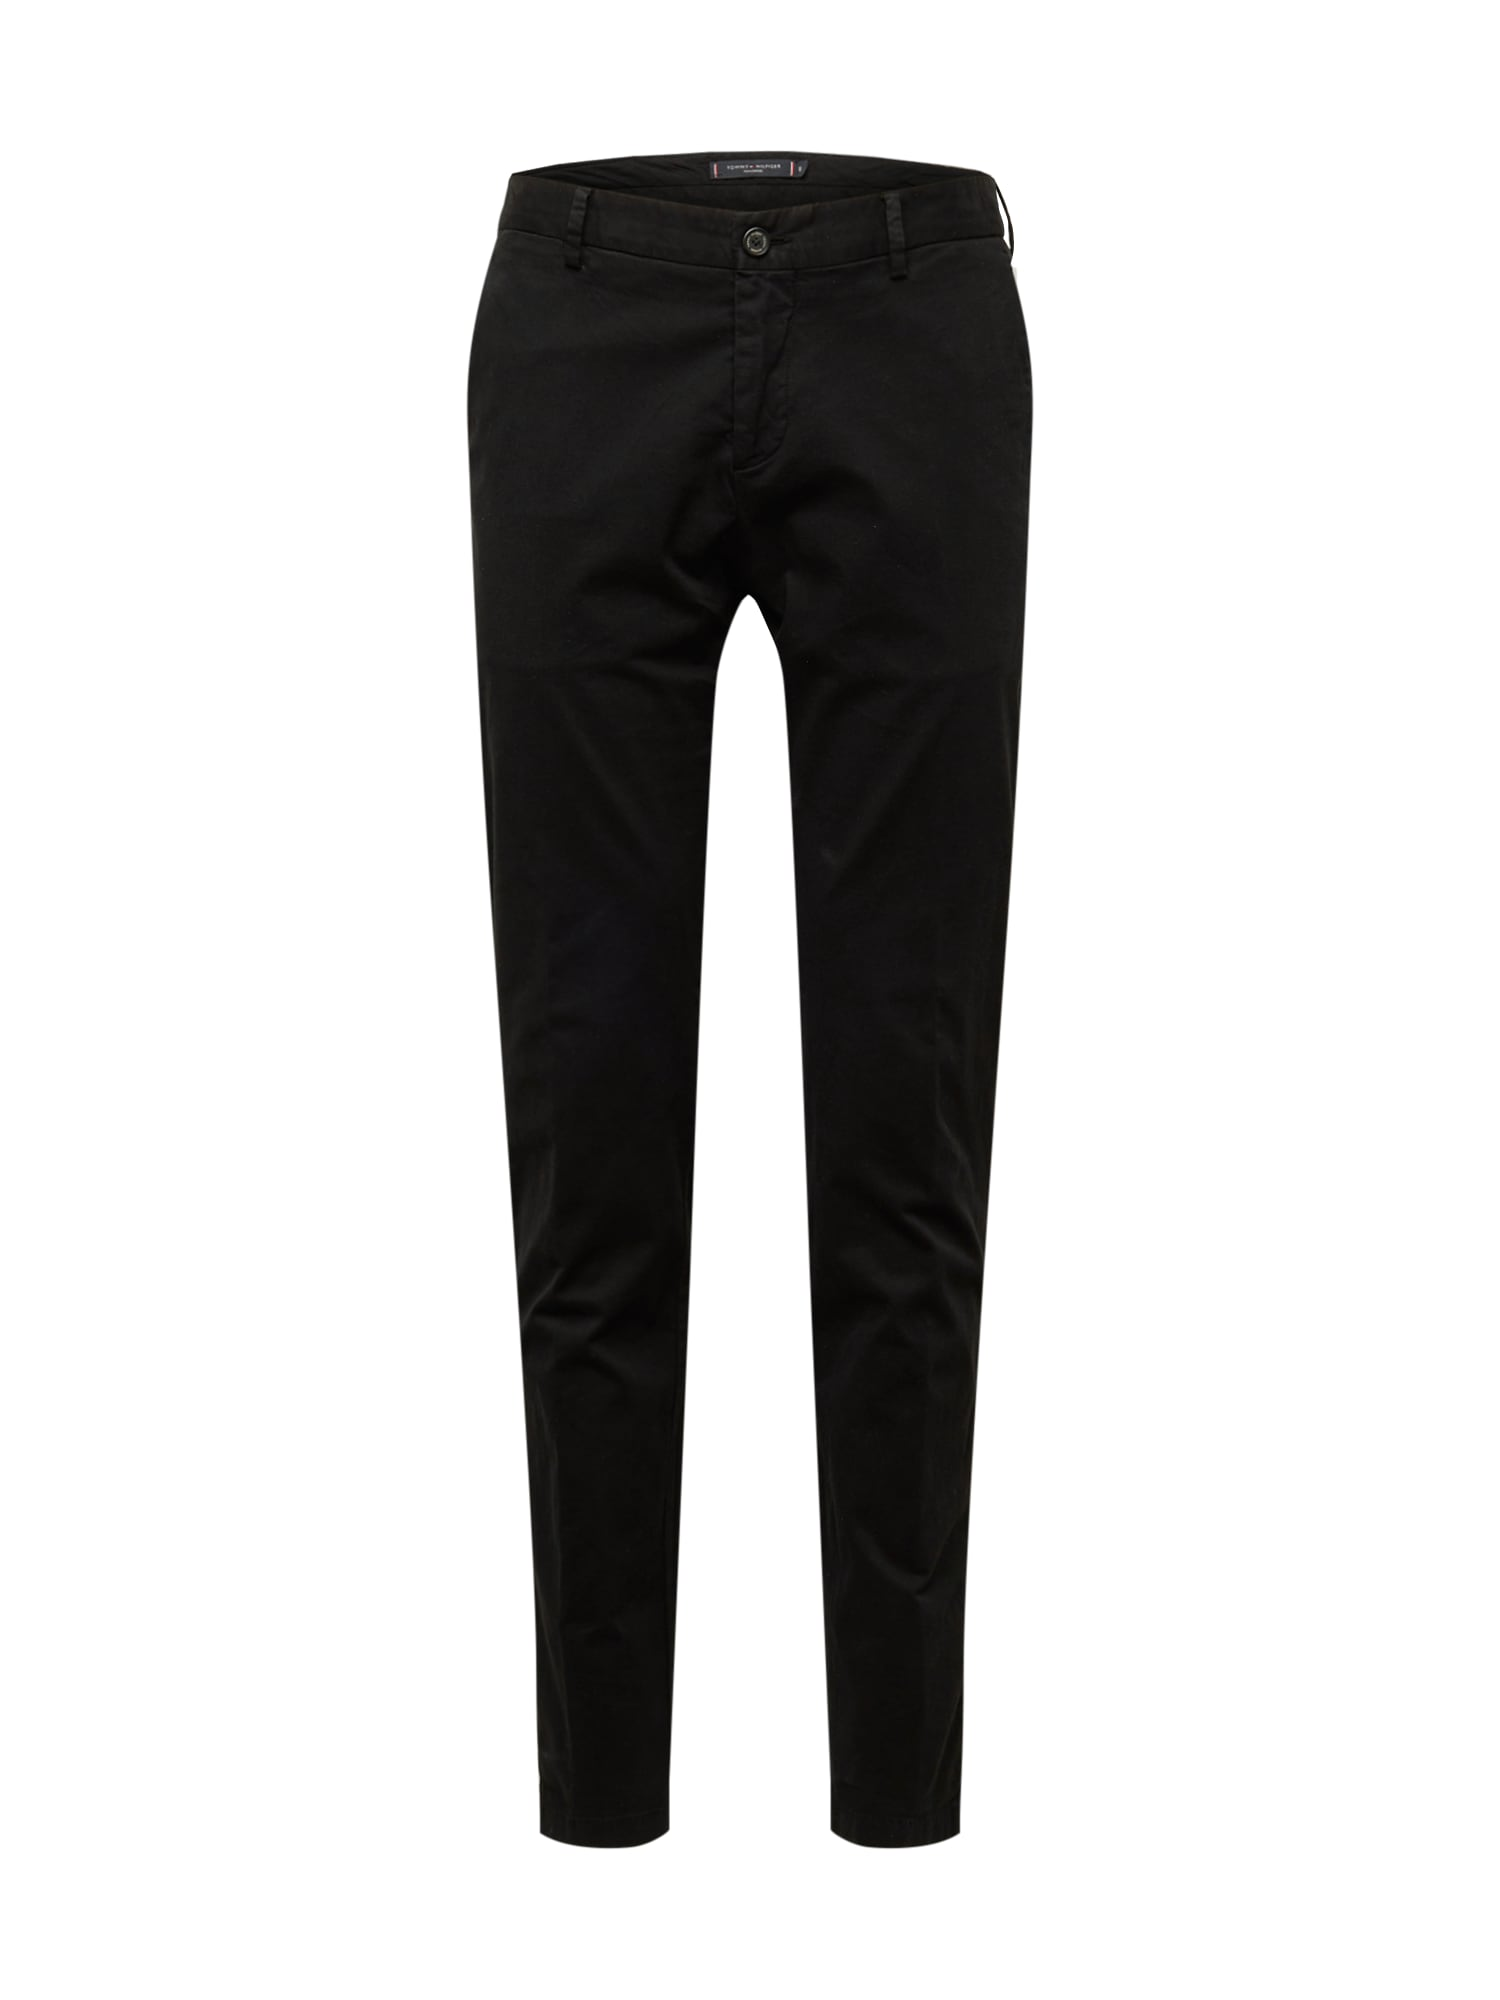 Tommy Hilfiger Tailored Kelnės juoda